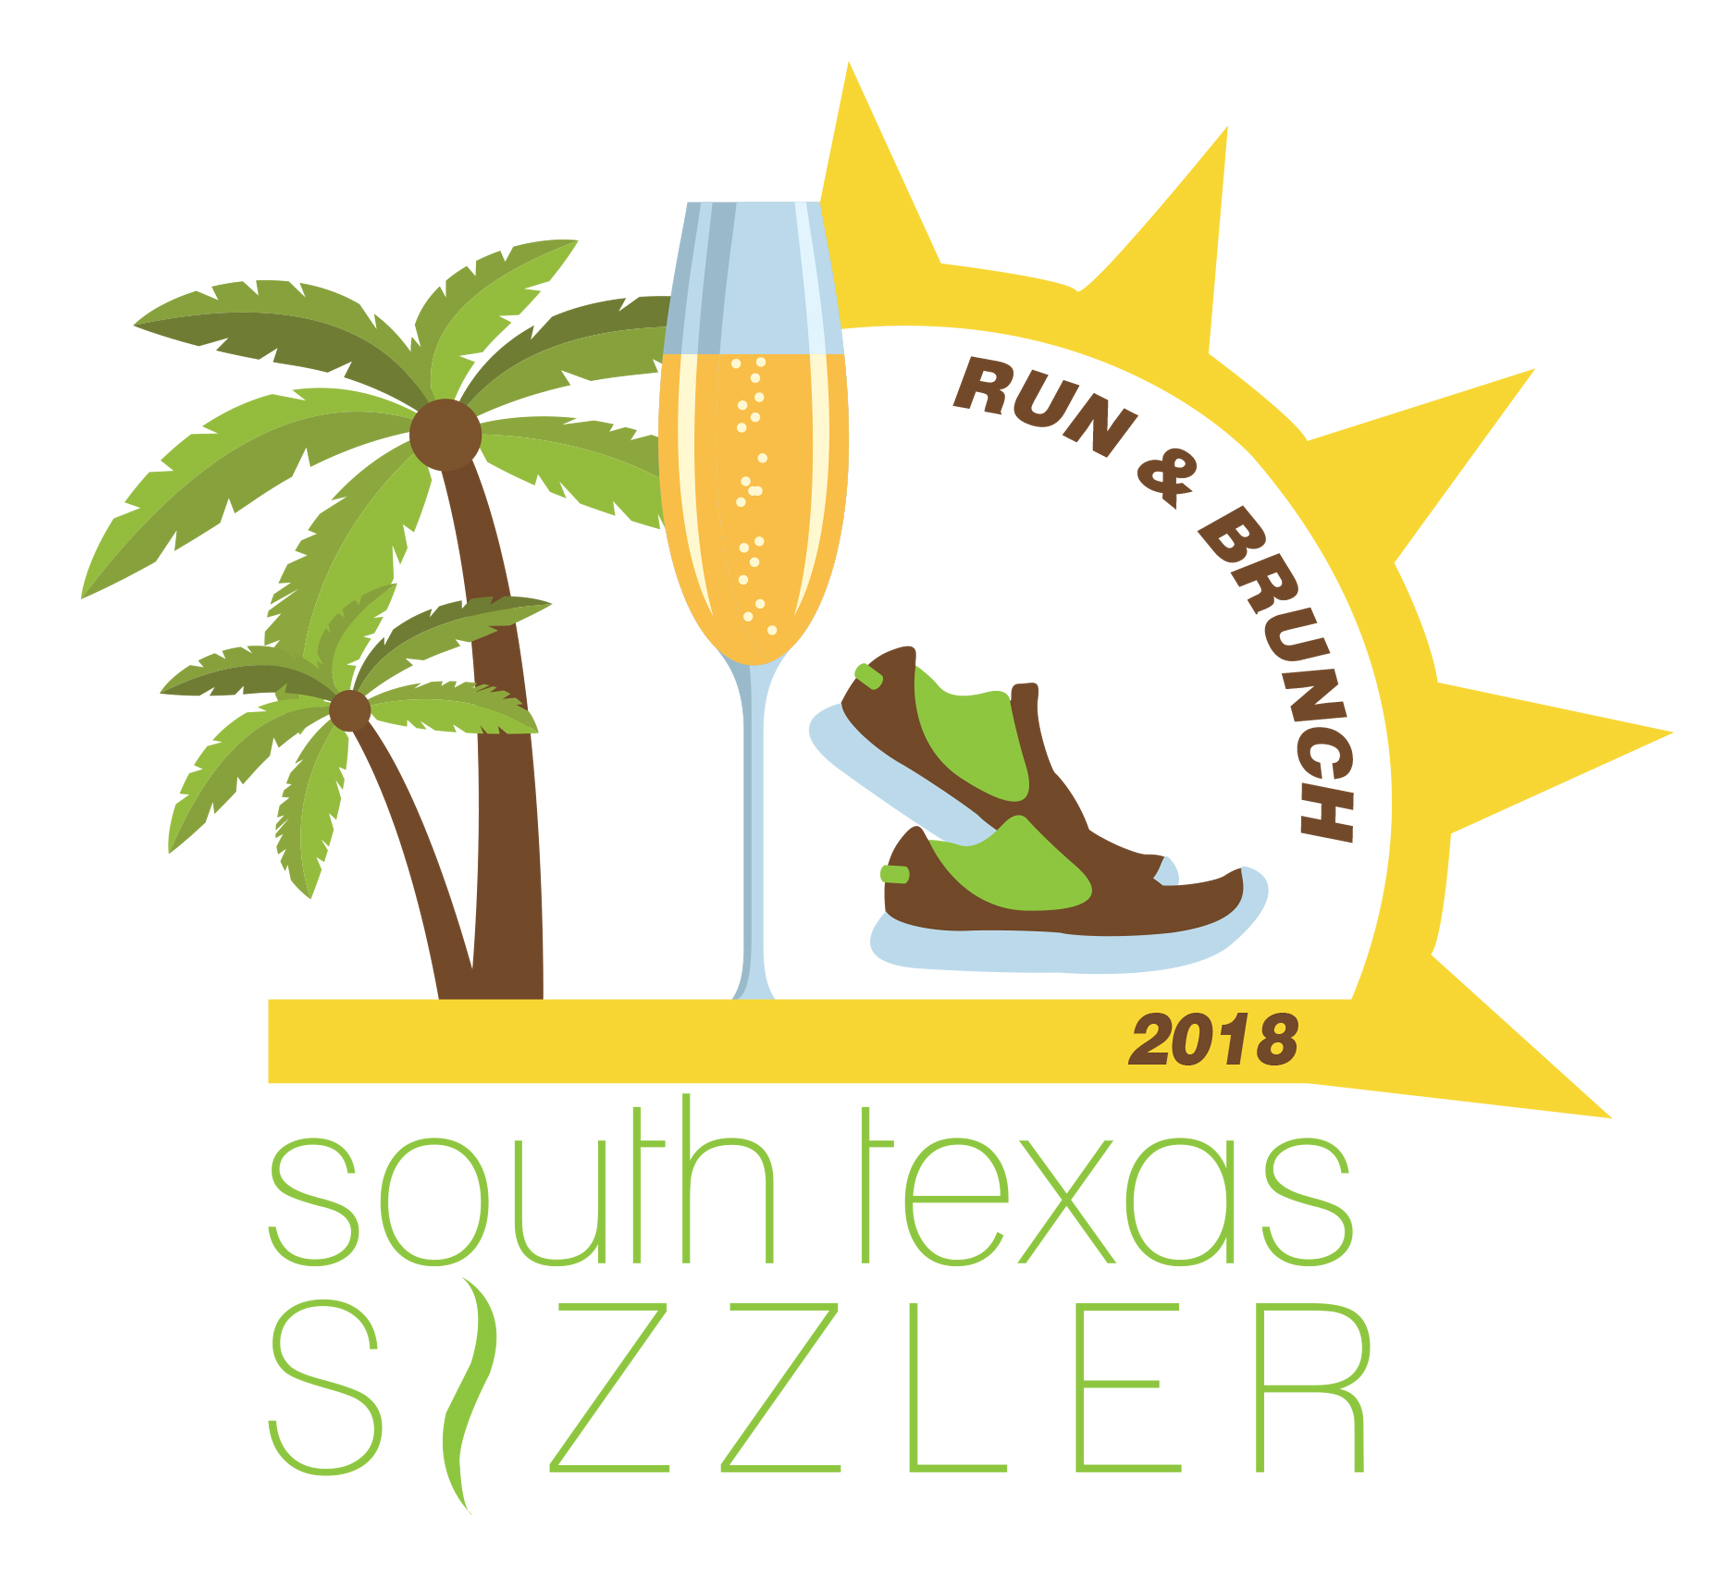 SouthTexasSizzler2018.jpg